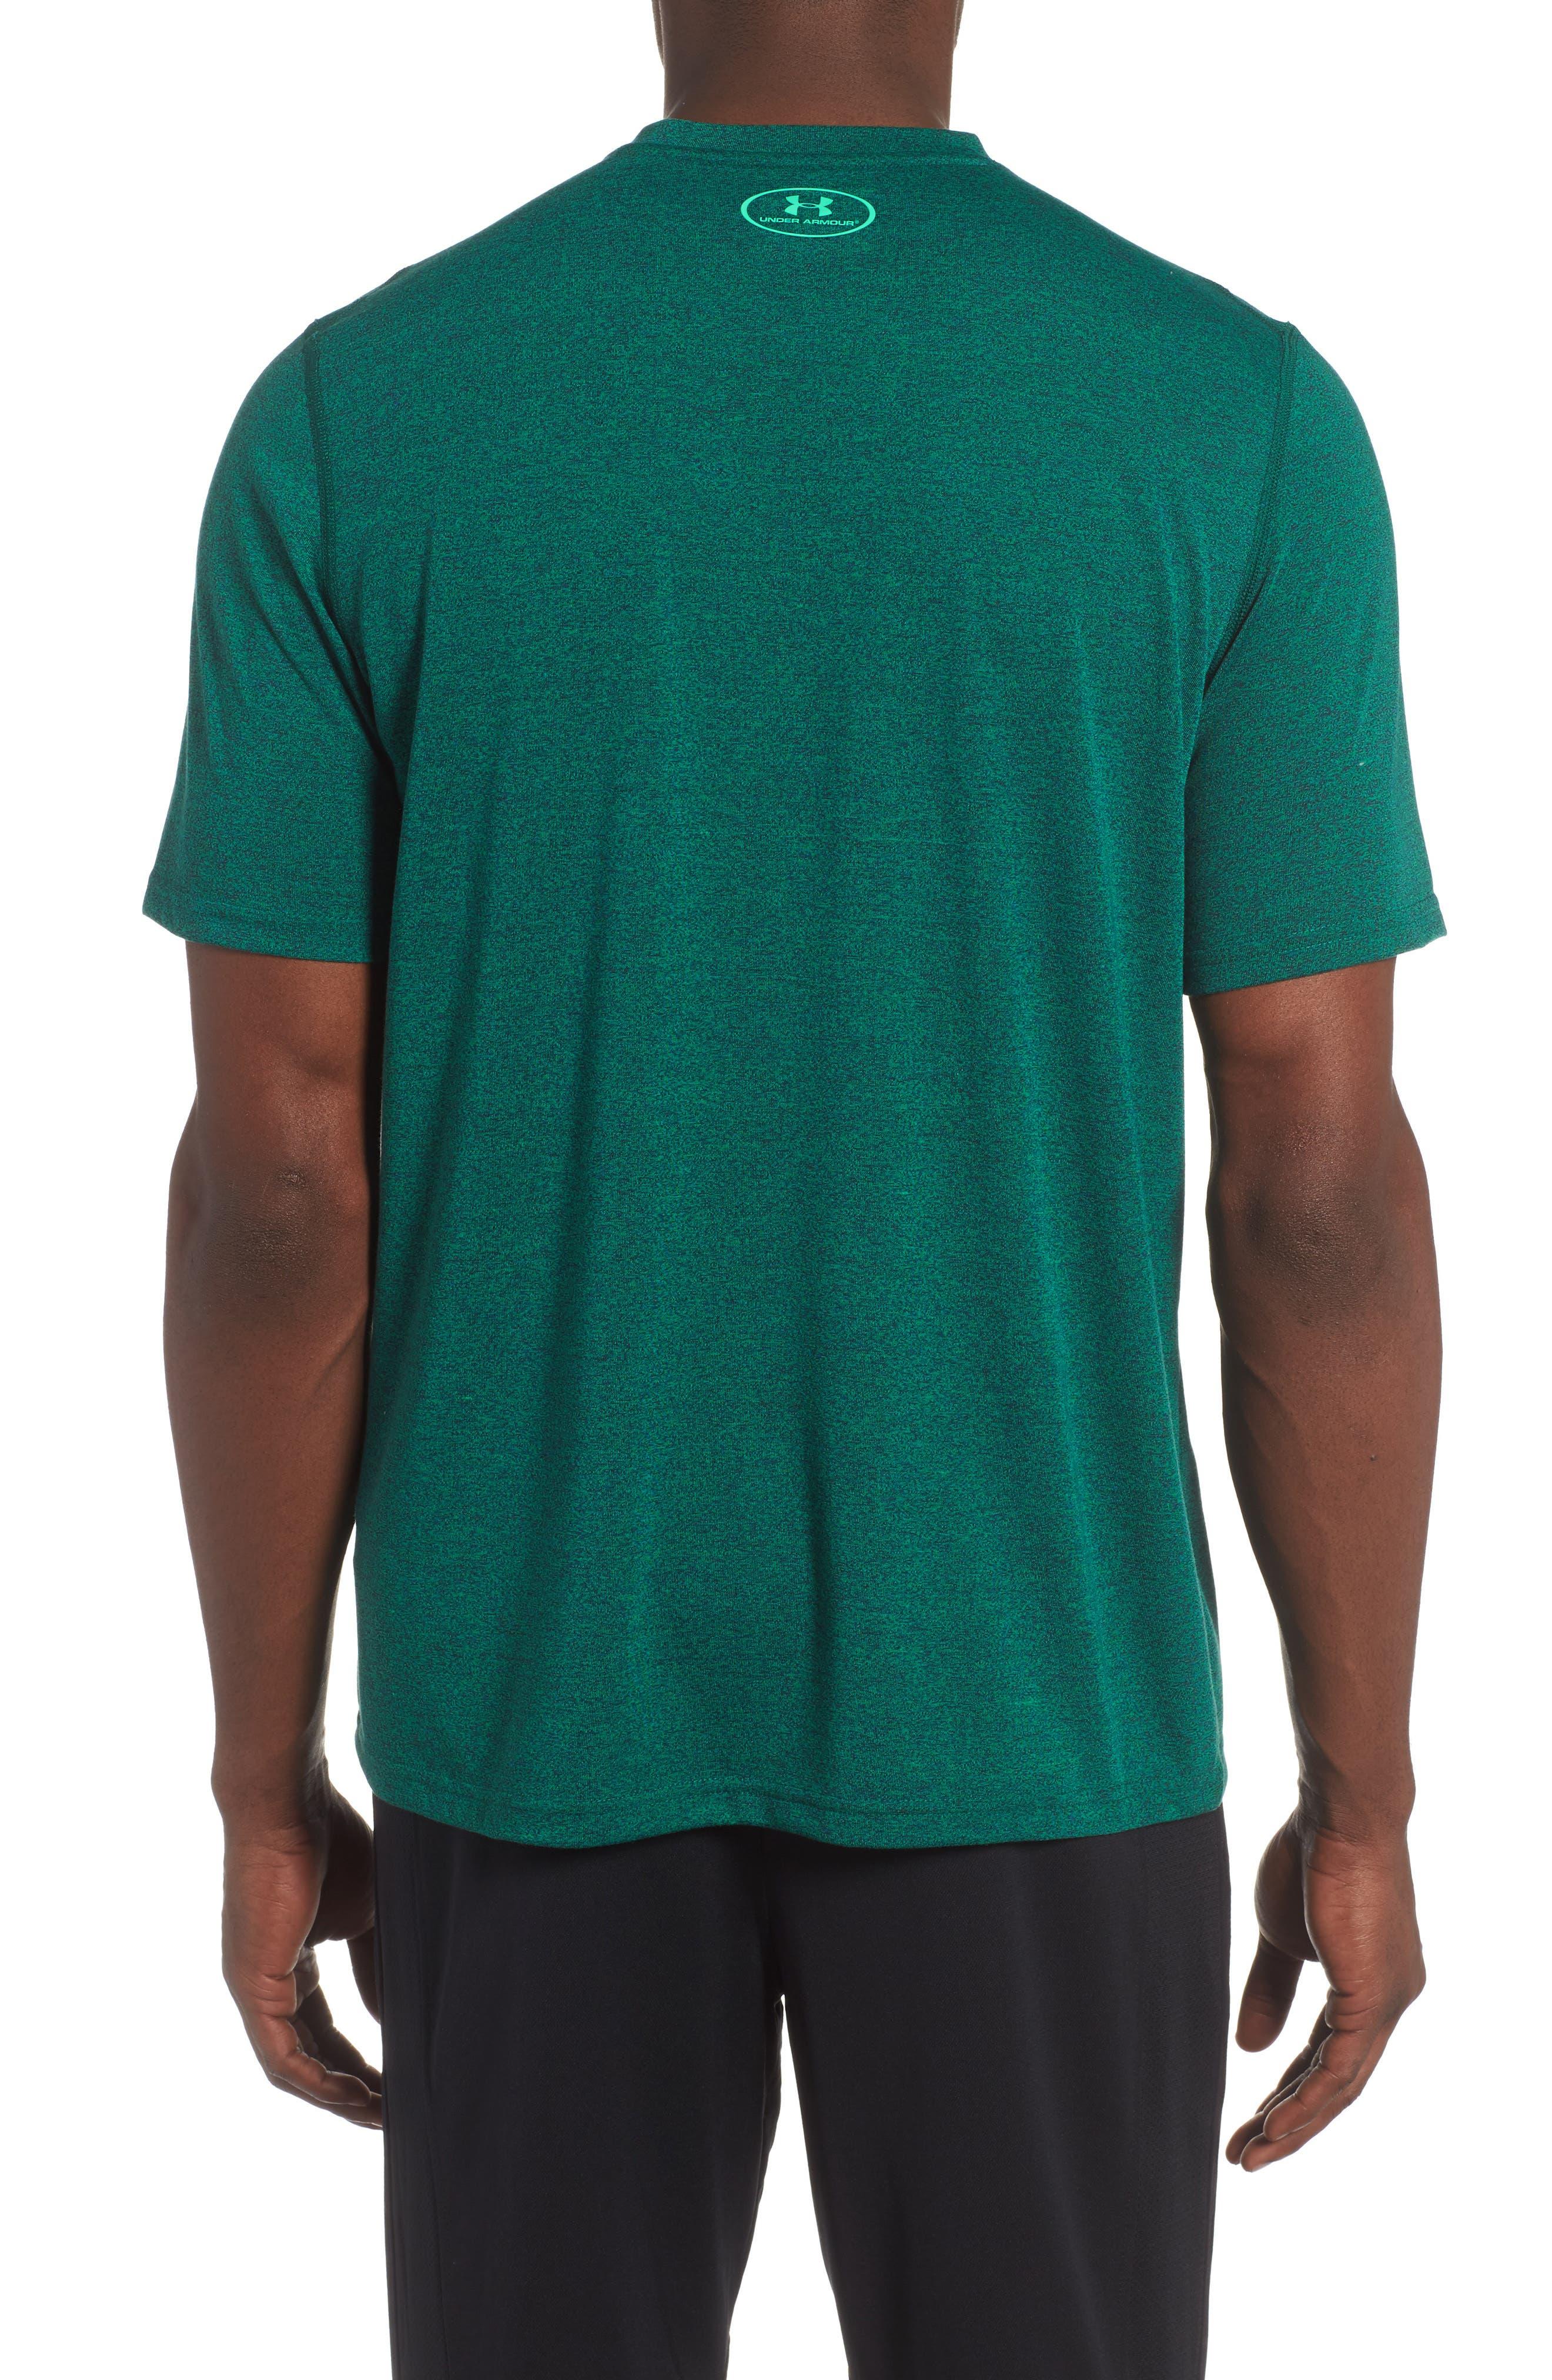 Threadborne Siro Regular Fit T-Shirt,                             Alternate thumbnail 2, color,                             Blue Marker/ Vapor Green